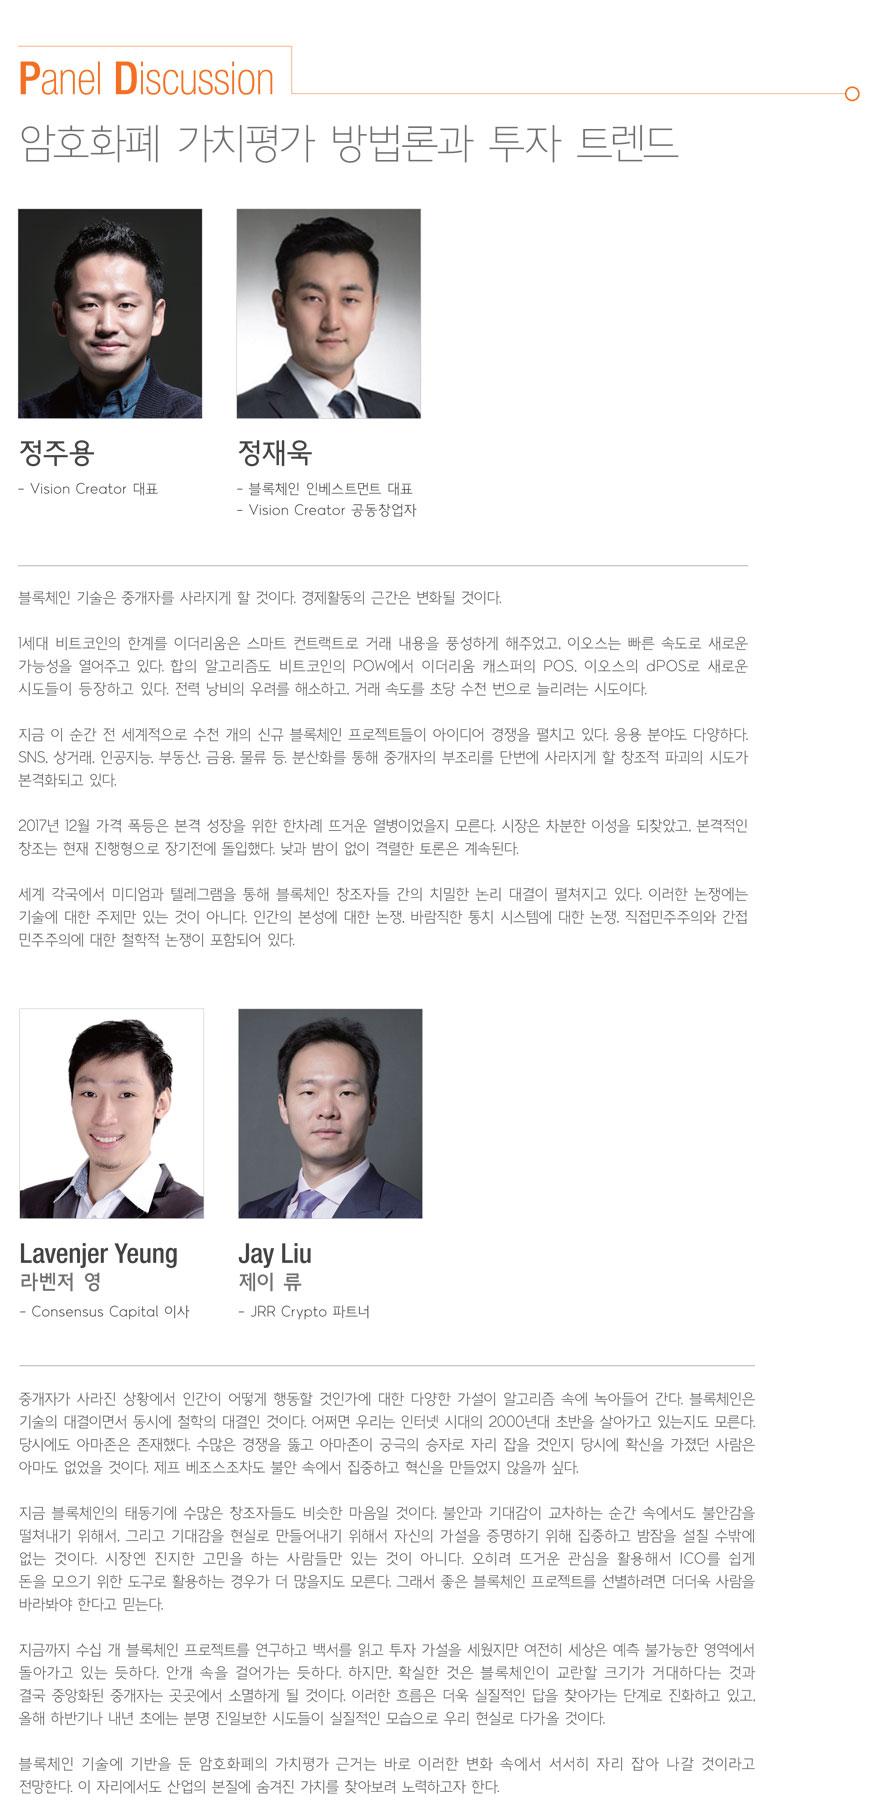 Panel Discussion:암호화폐 가치평가 방법론과 투자 트렌드, 정주용, 정재욱, 라벤저 영, 제이 류